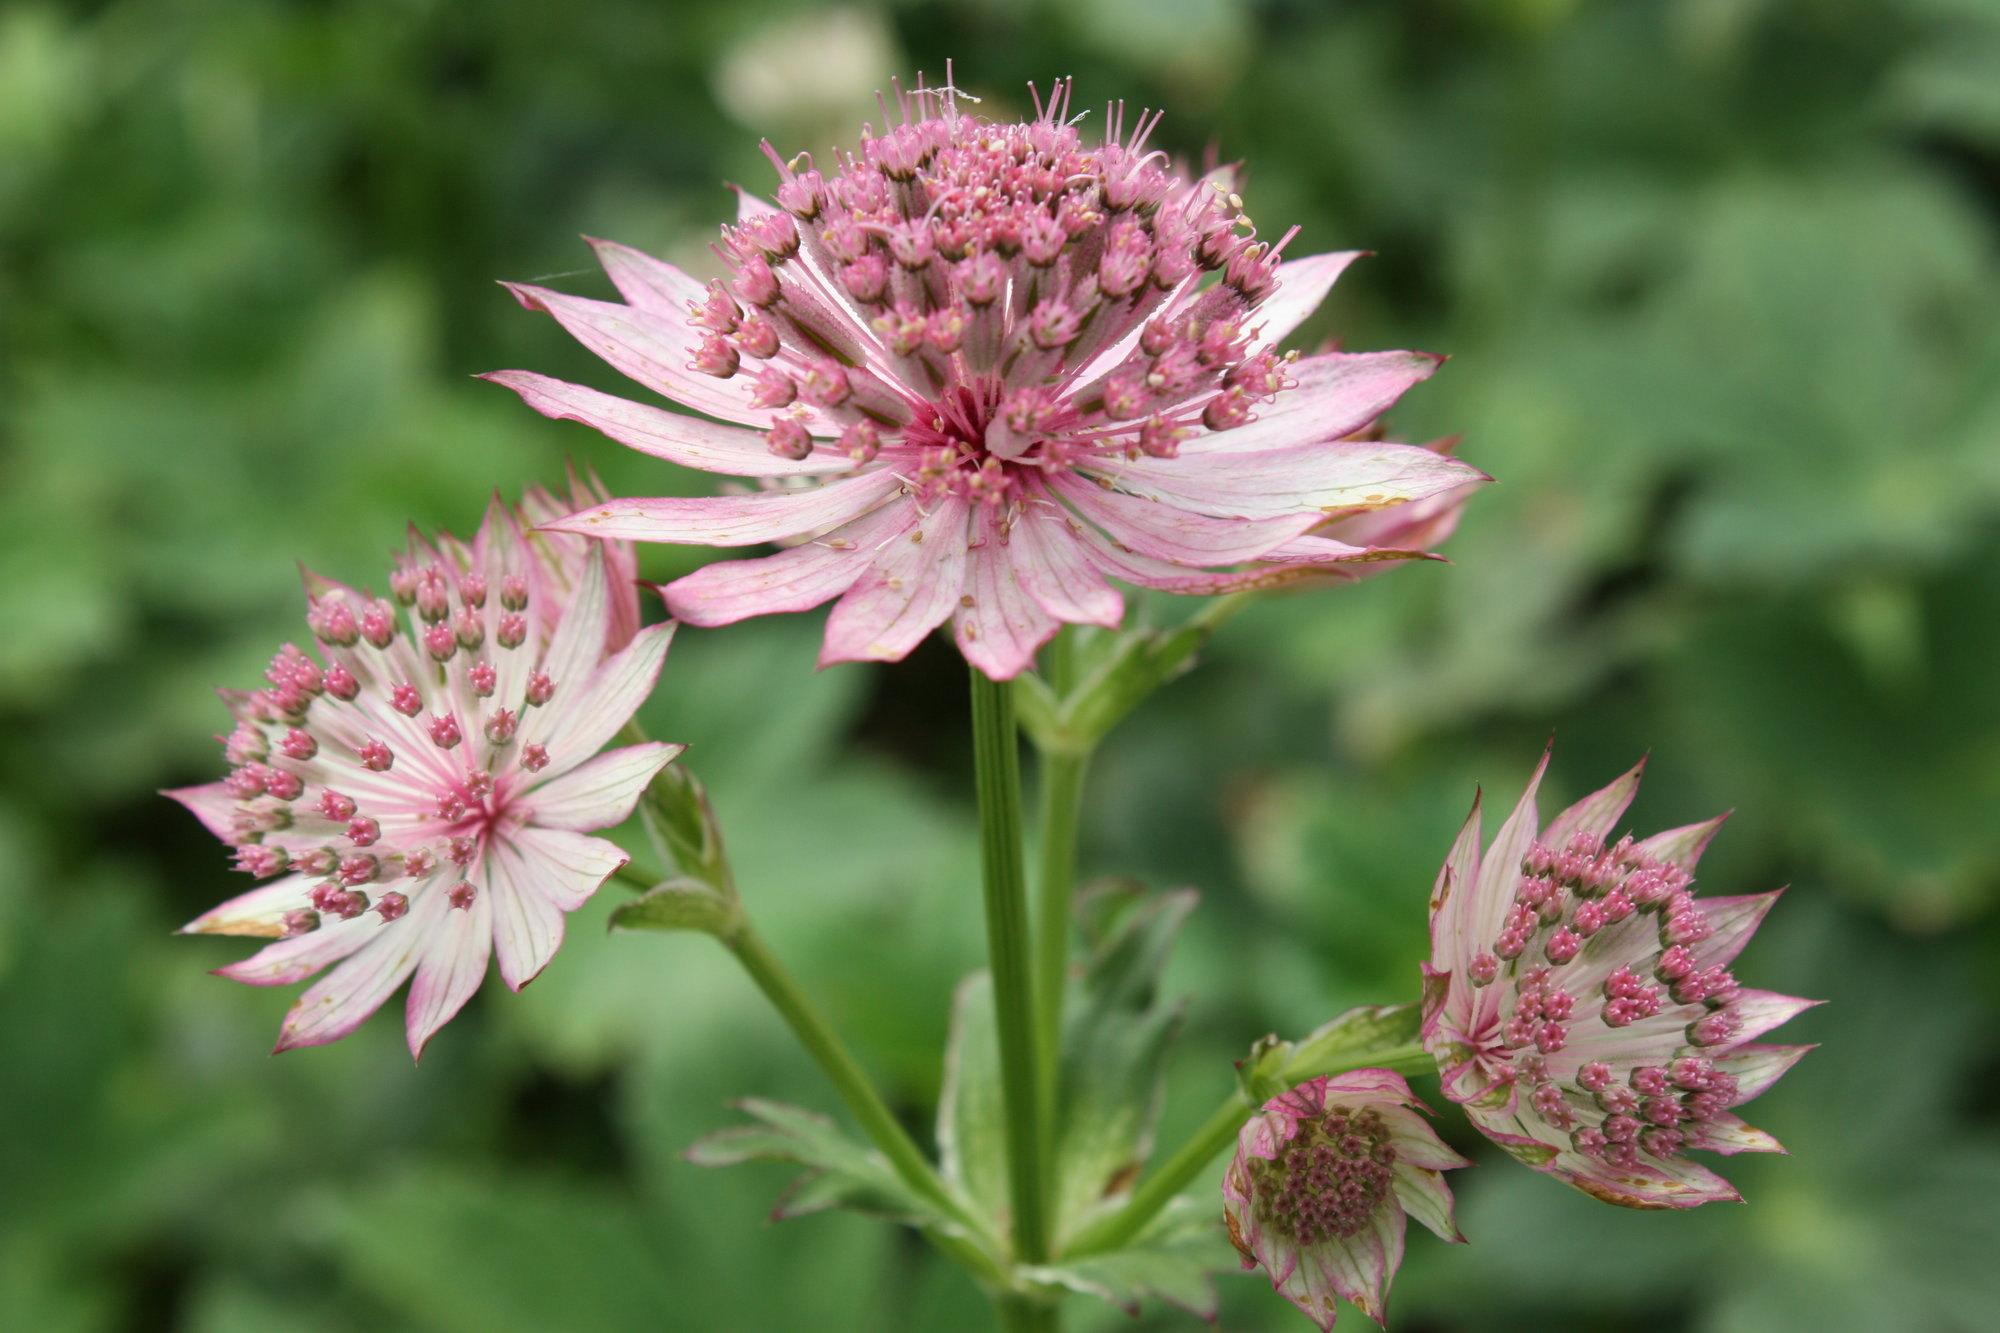 Астранция выращивание из семян, сорта с описанием и фото